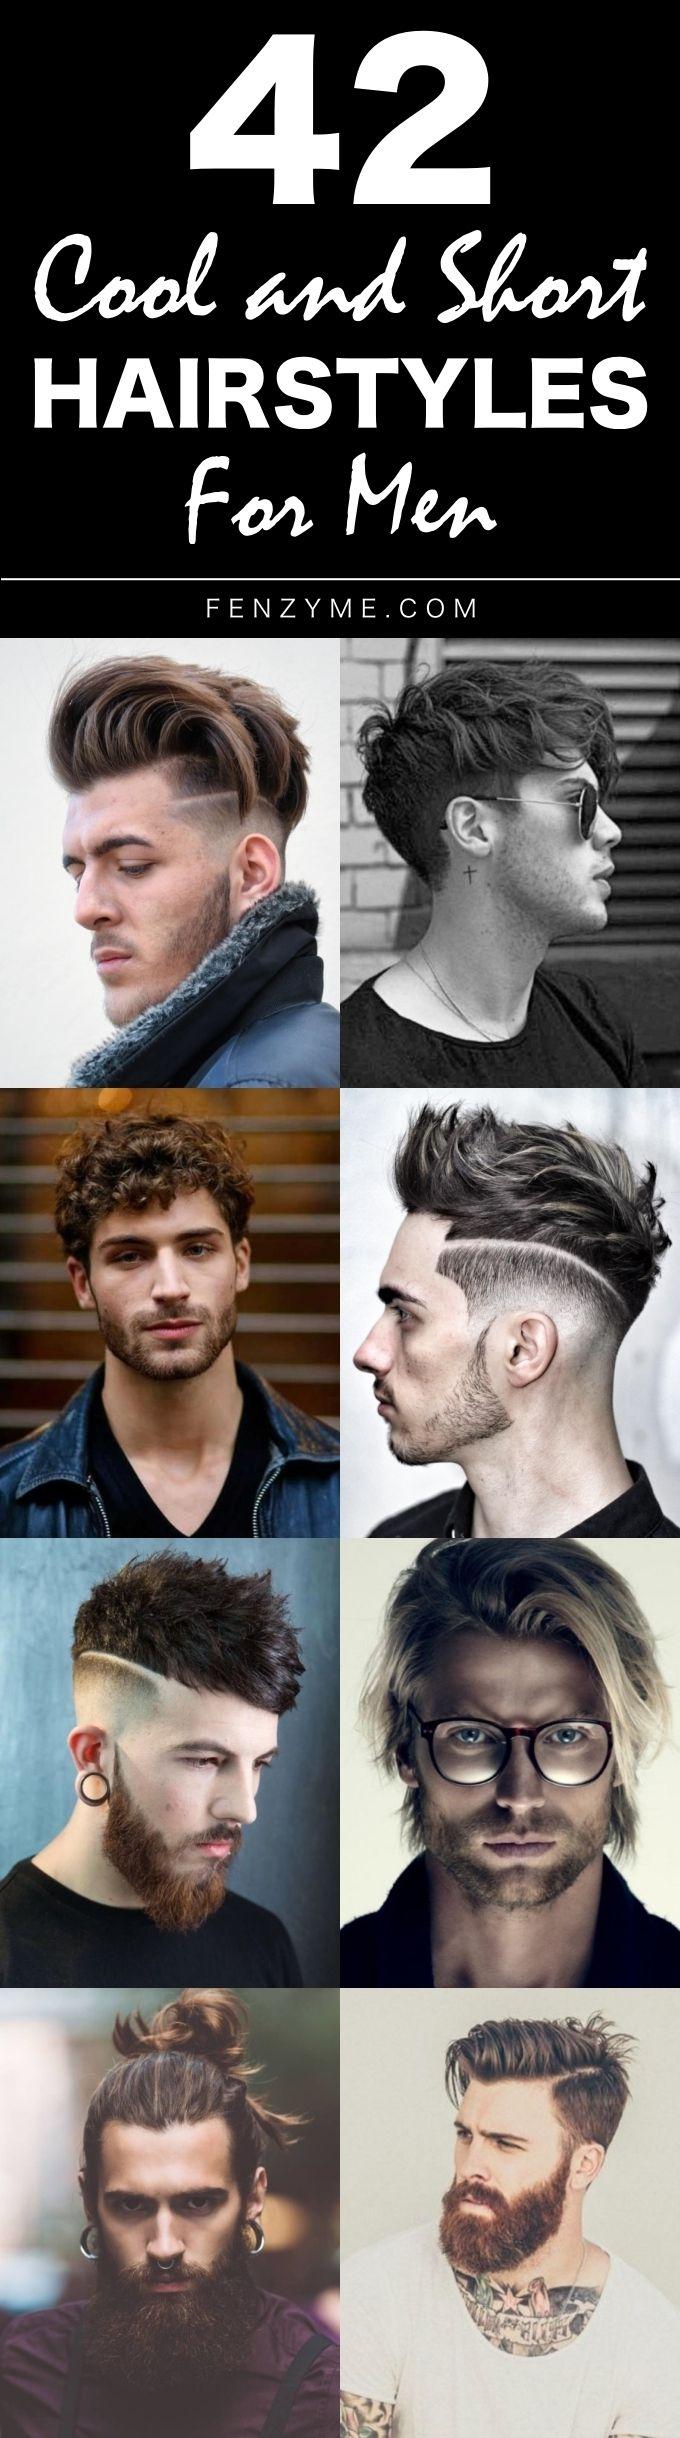 Mens short haircuts 2018  cool and short hairstyles for men   menus fashion